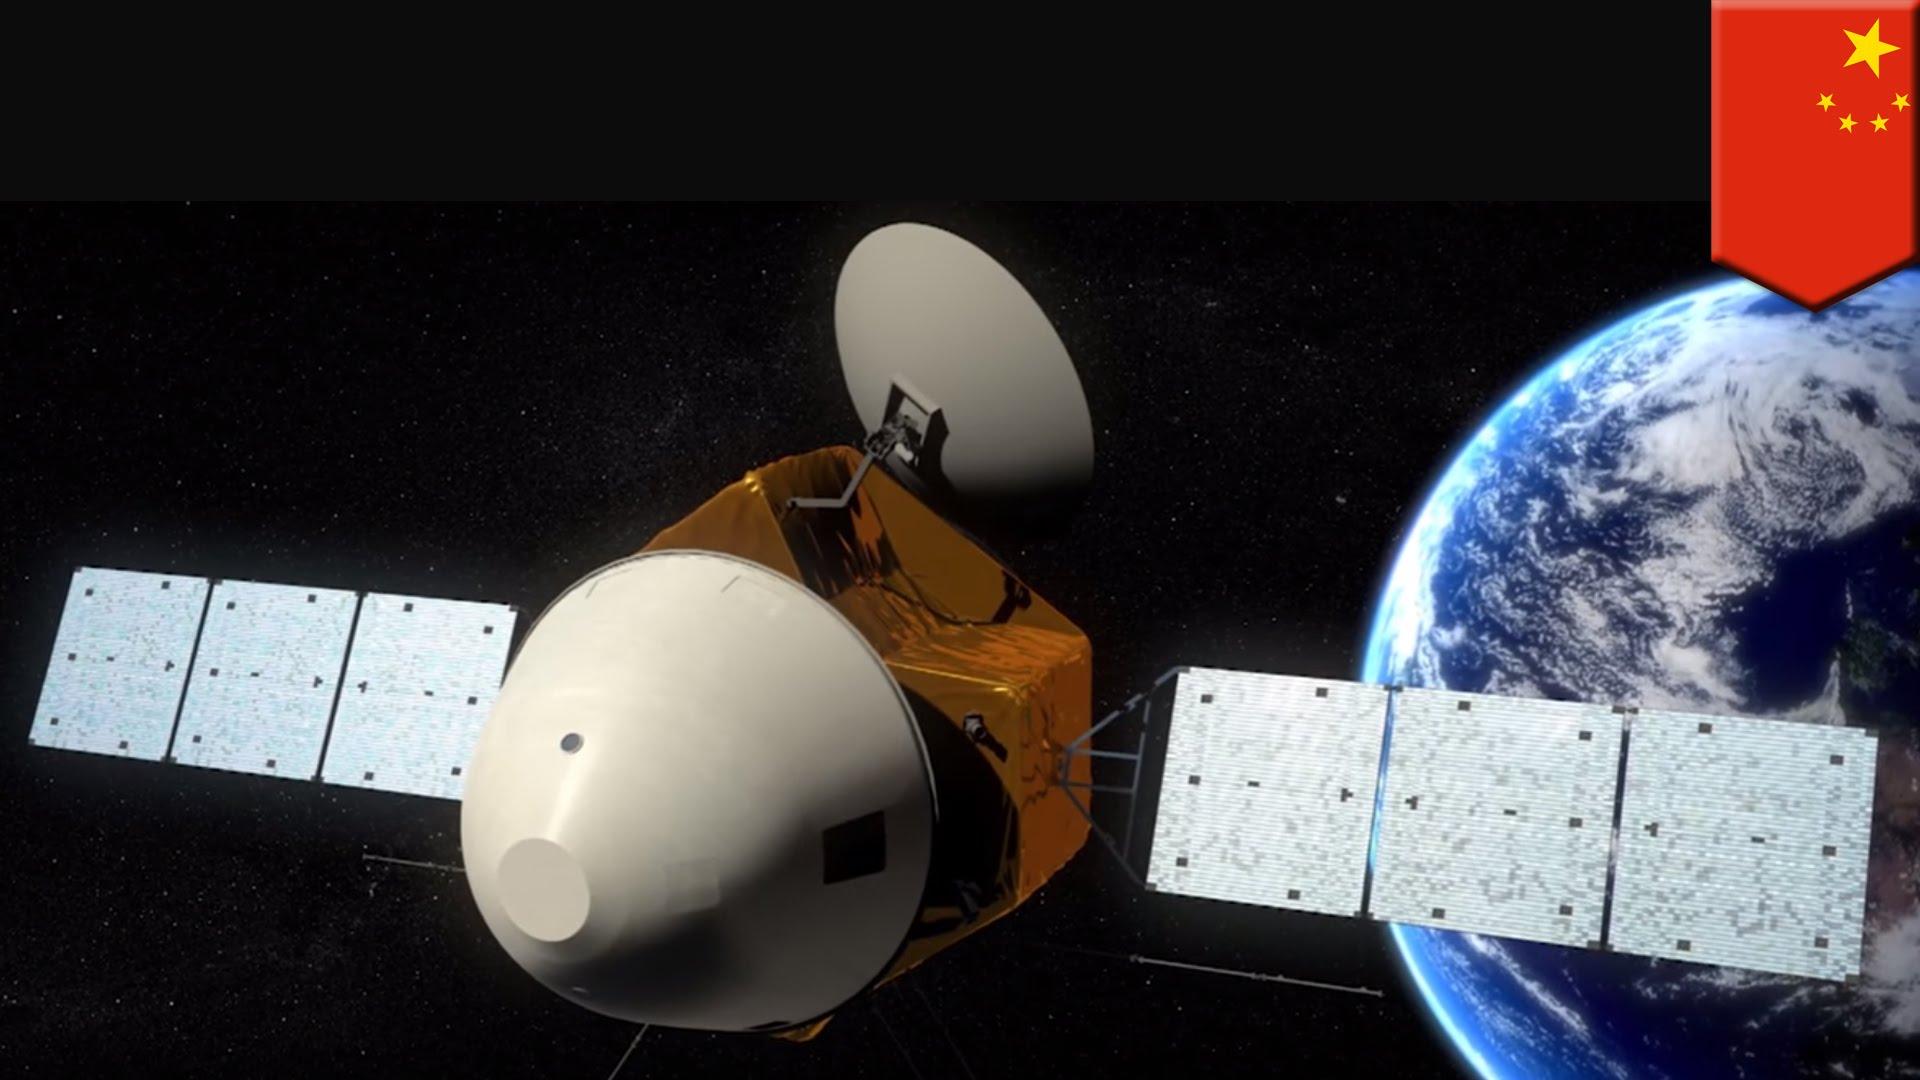 Mars missionsX JupiterX China National Space Administration.X Jupiter system